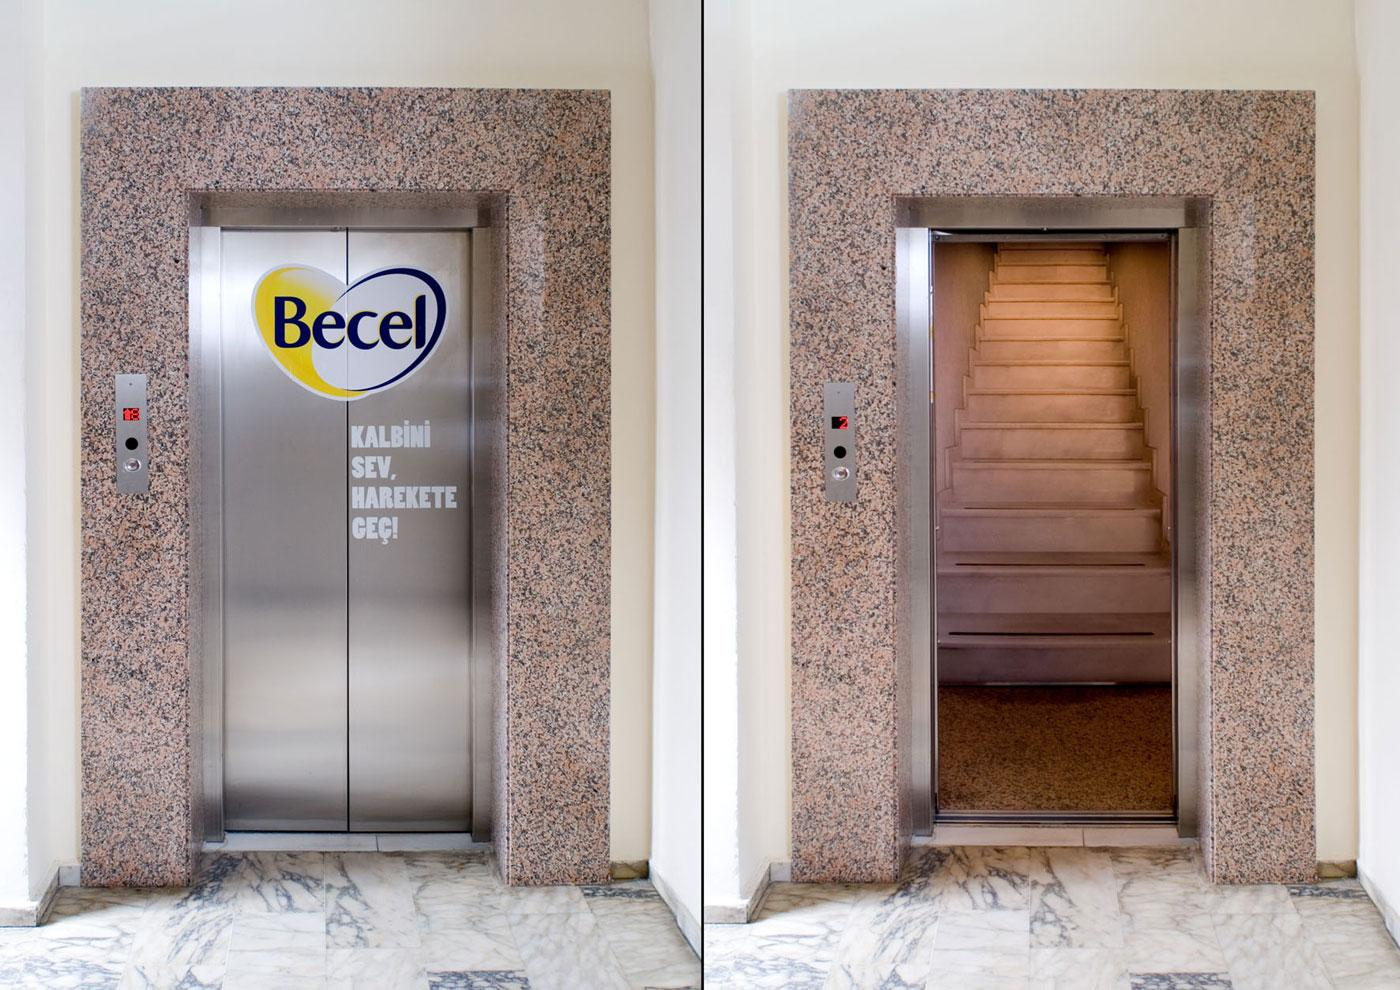 Becel Ambient Ad -  Elevator